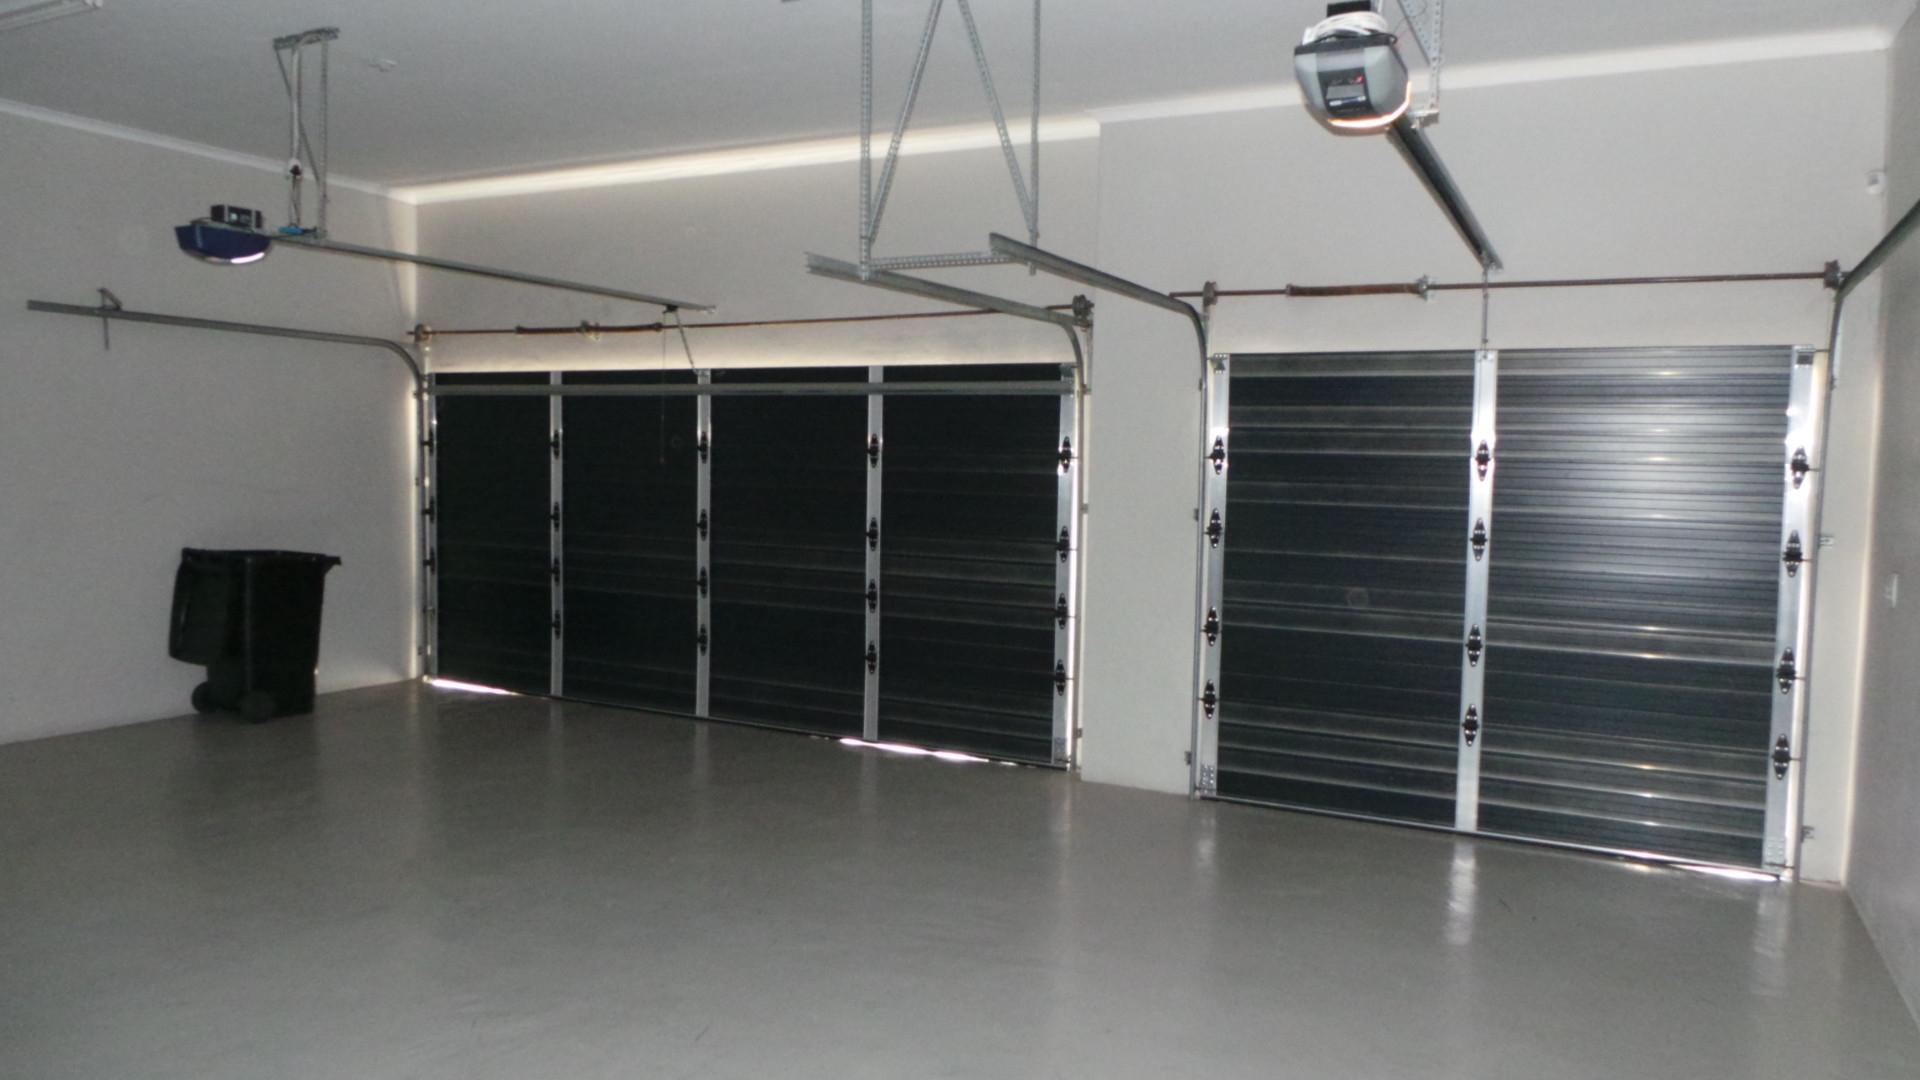 Garage fits 3 cars